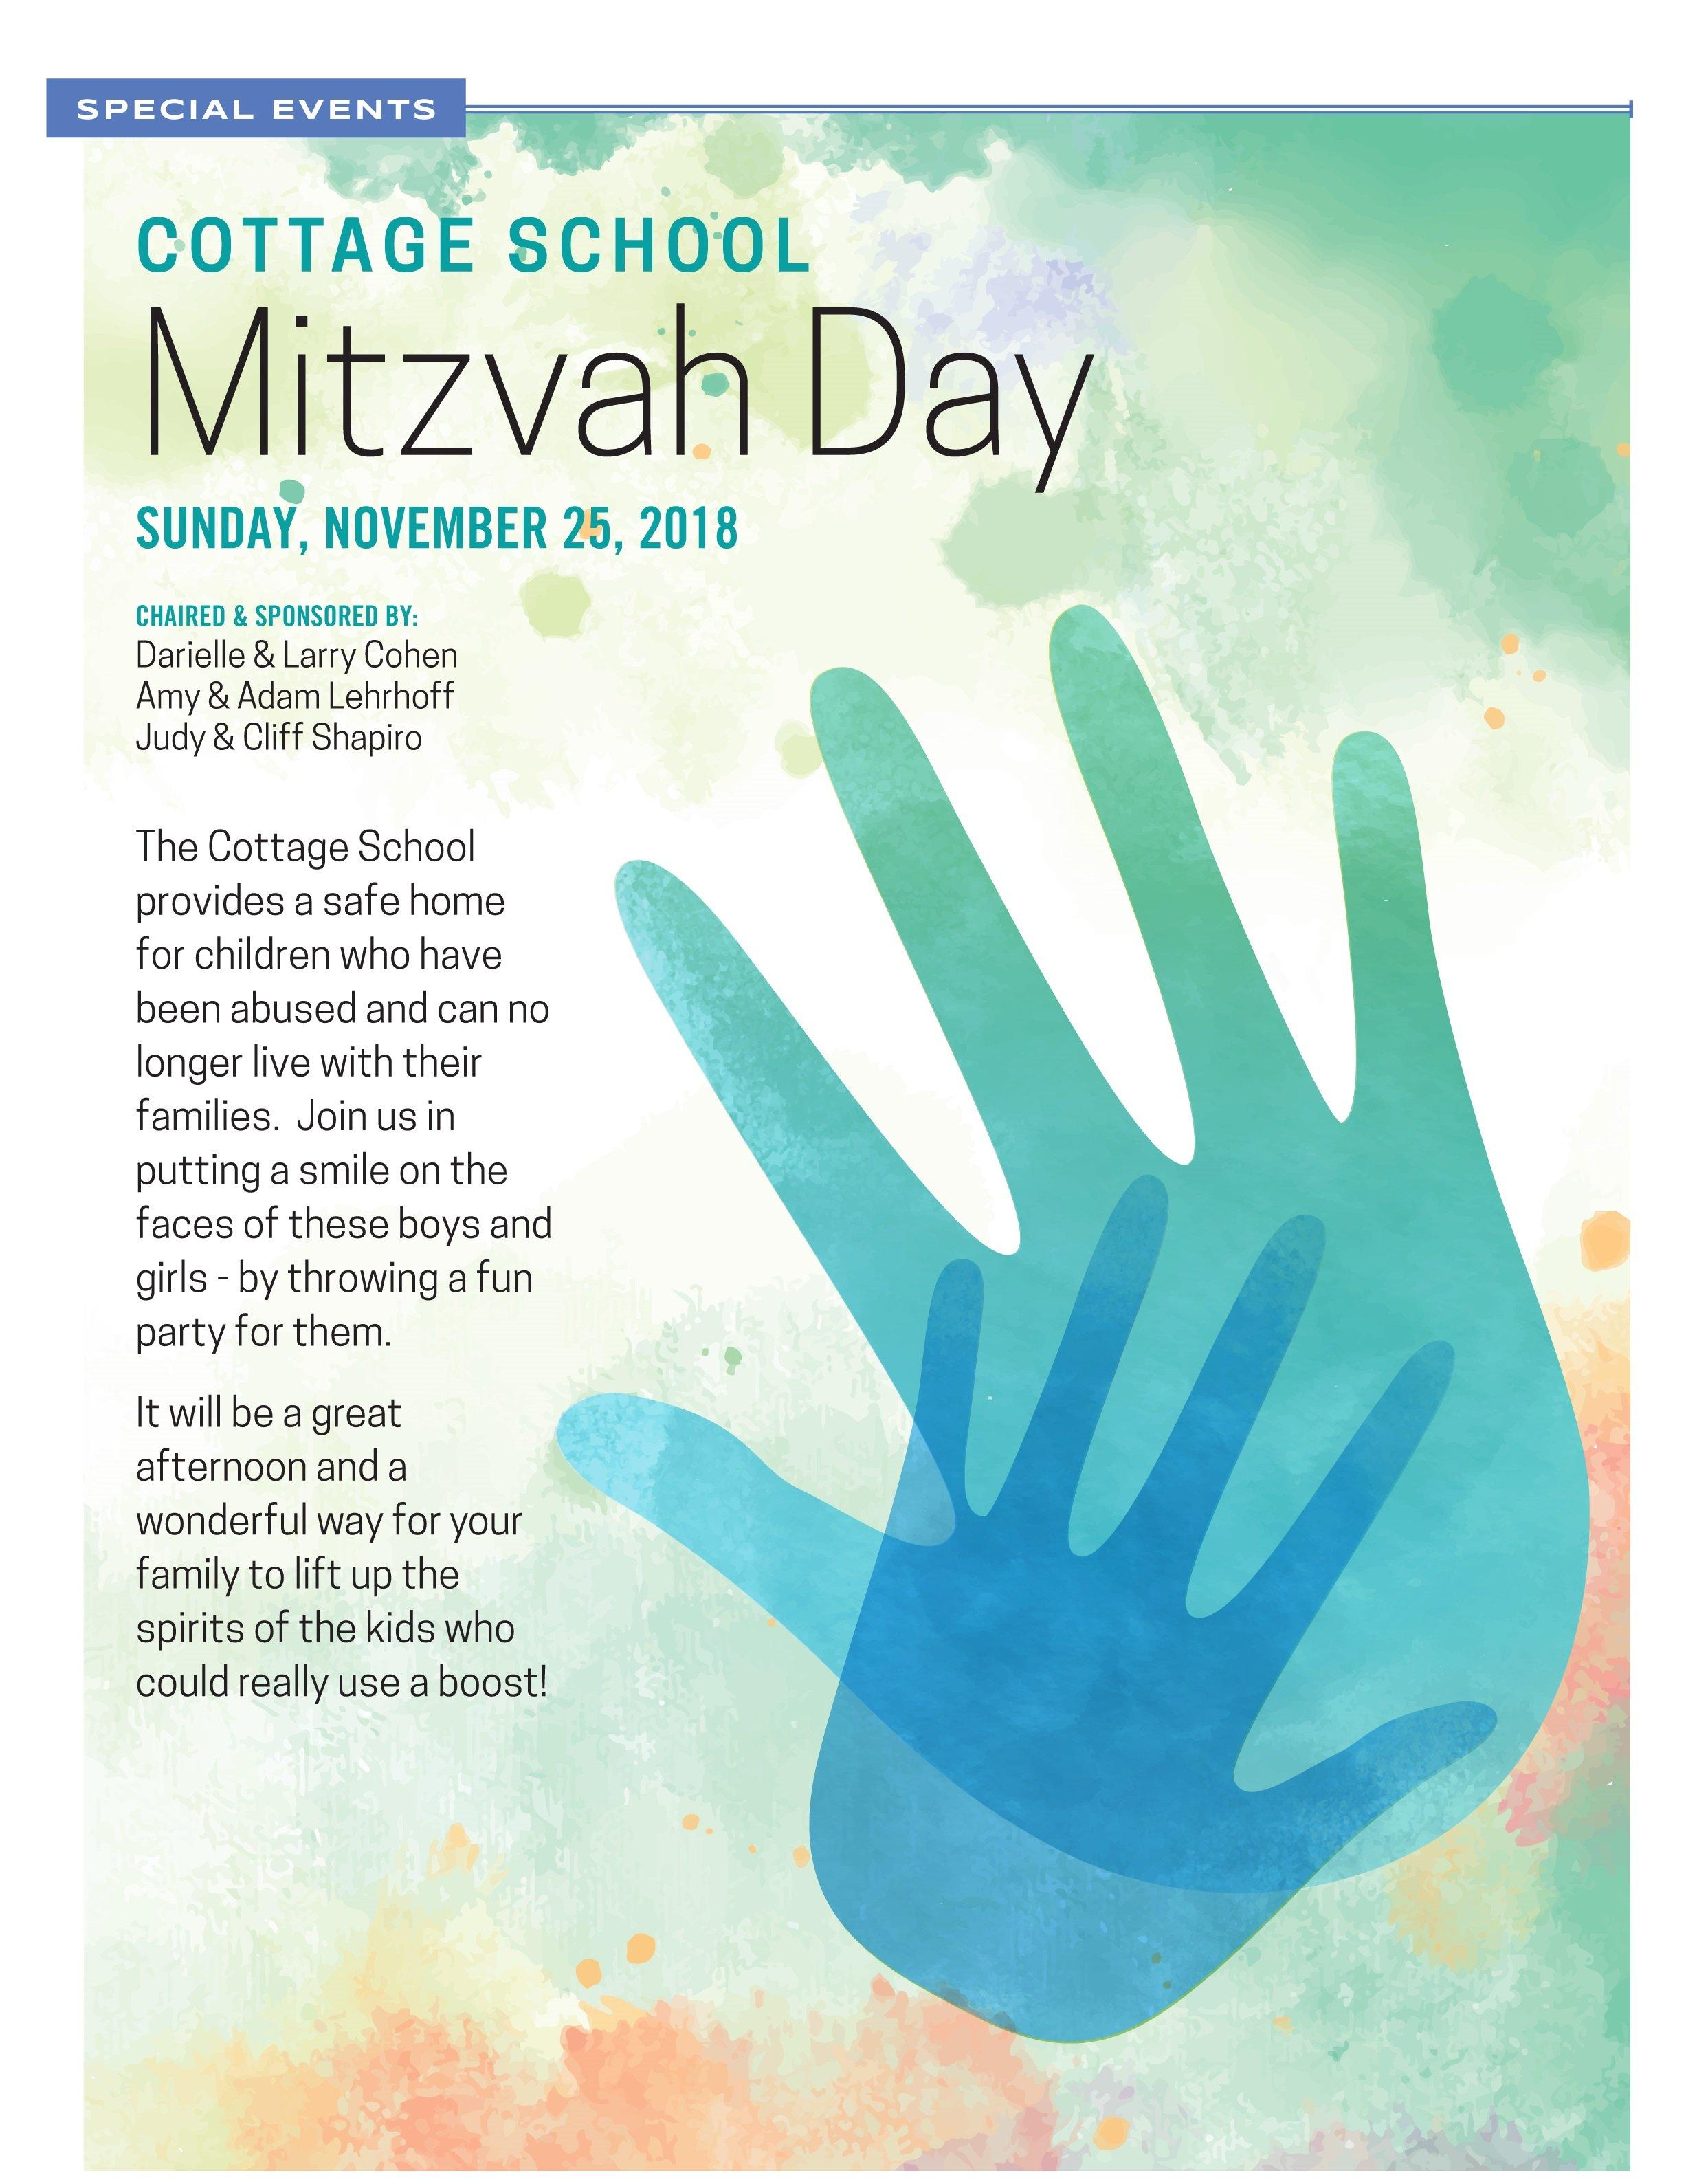 mitzvah day.jpg